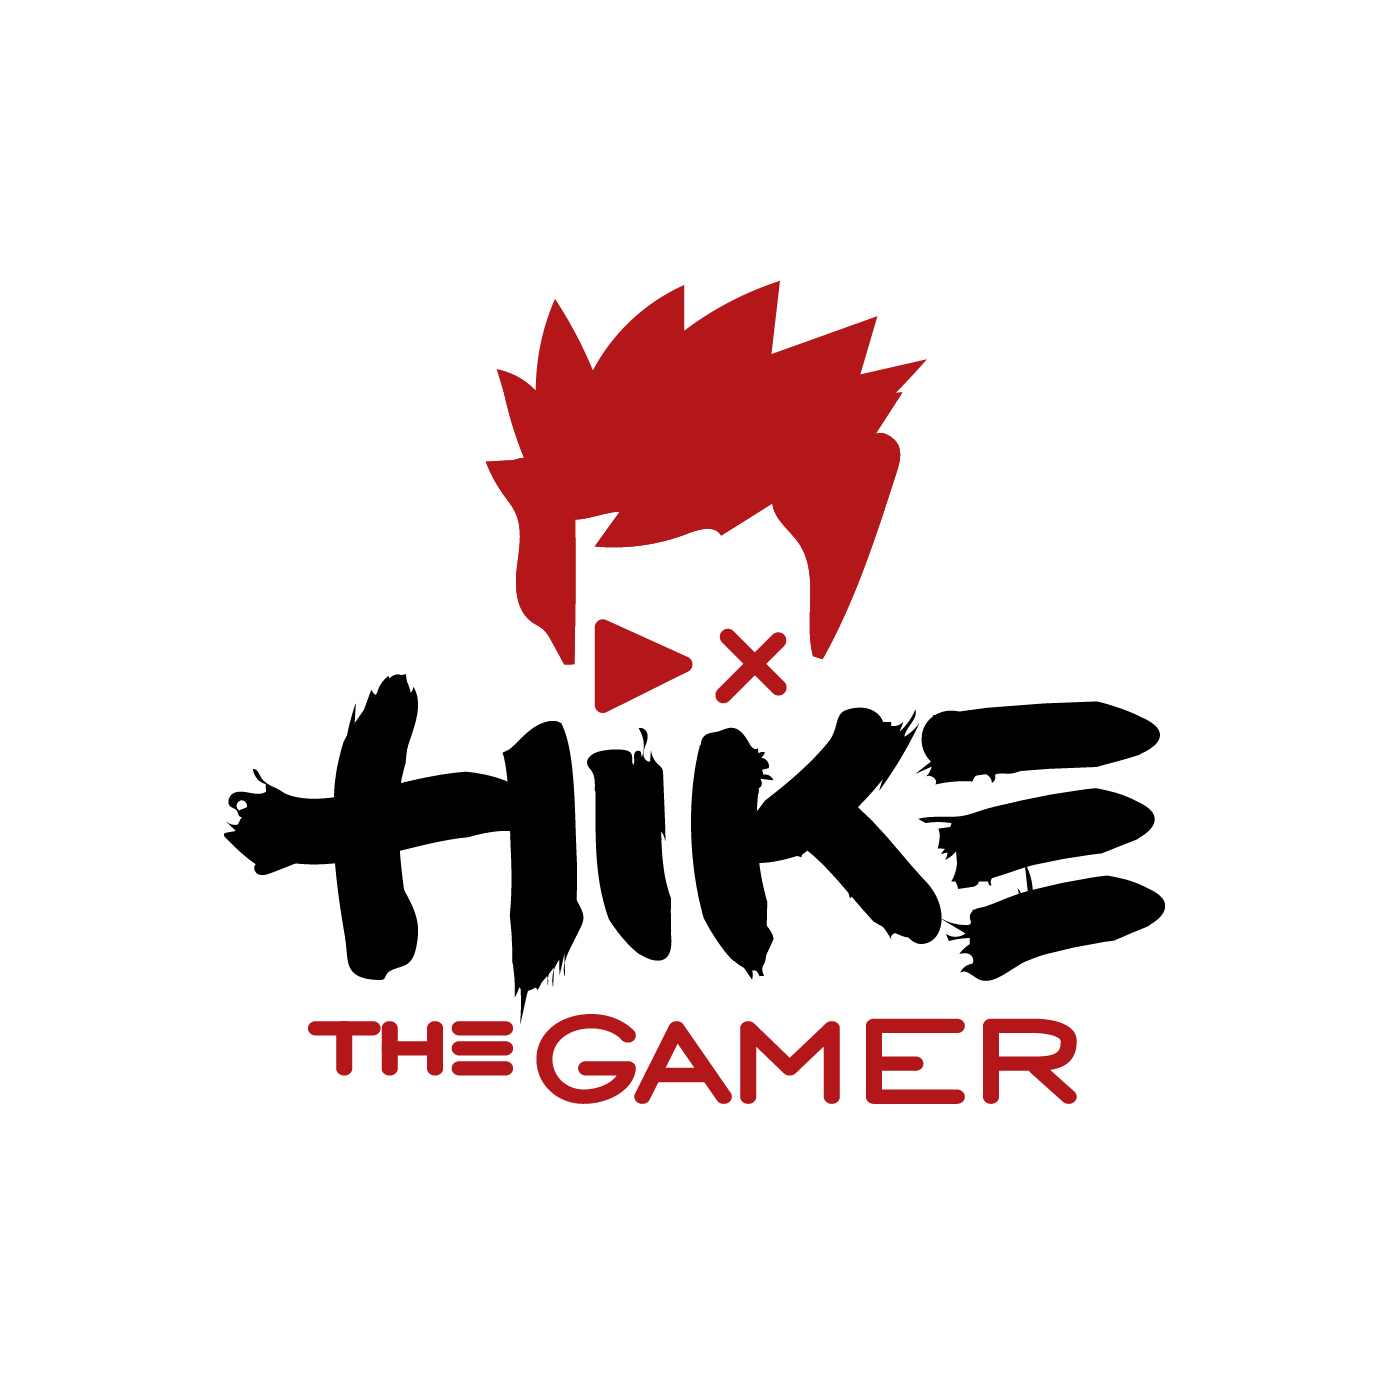 Hike-The-Gamer-Logo-Josh-Hunter.jpg